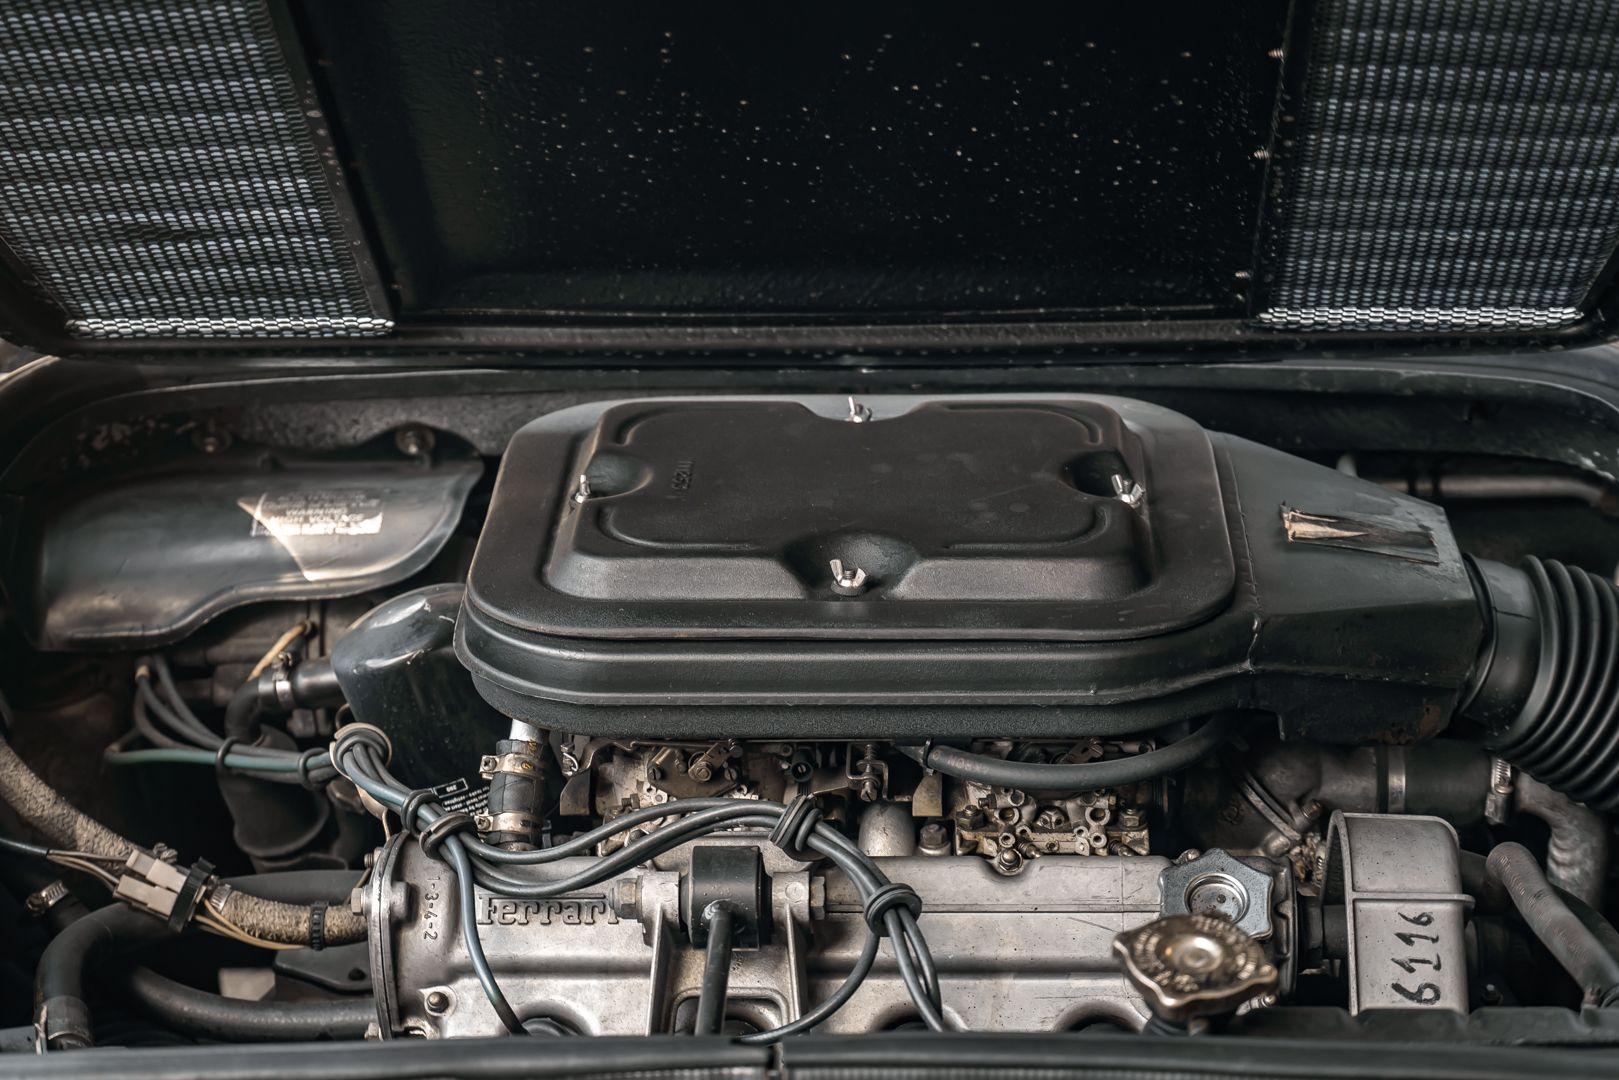 1982 Ferrari 208 GTS Carburatori 75983